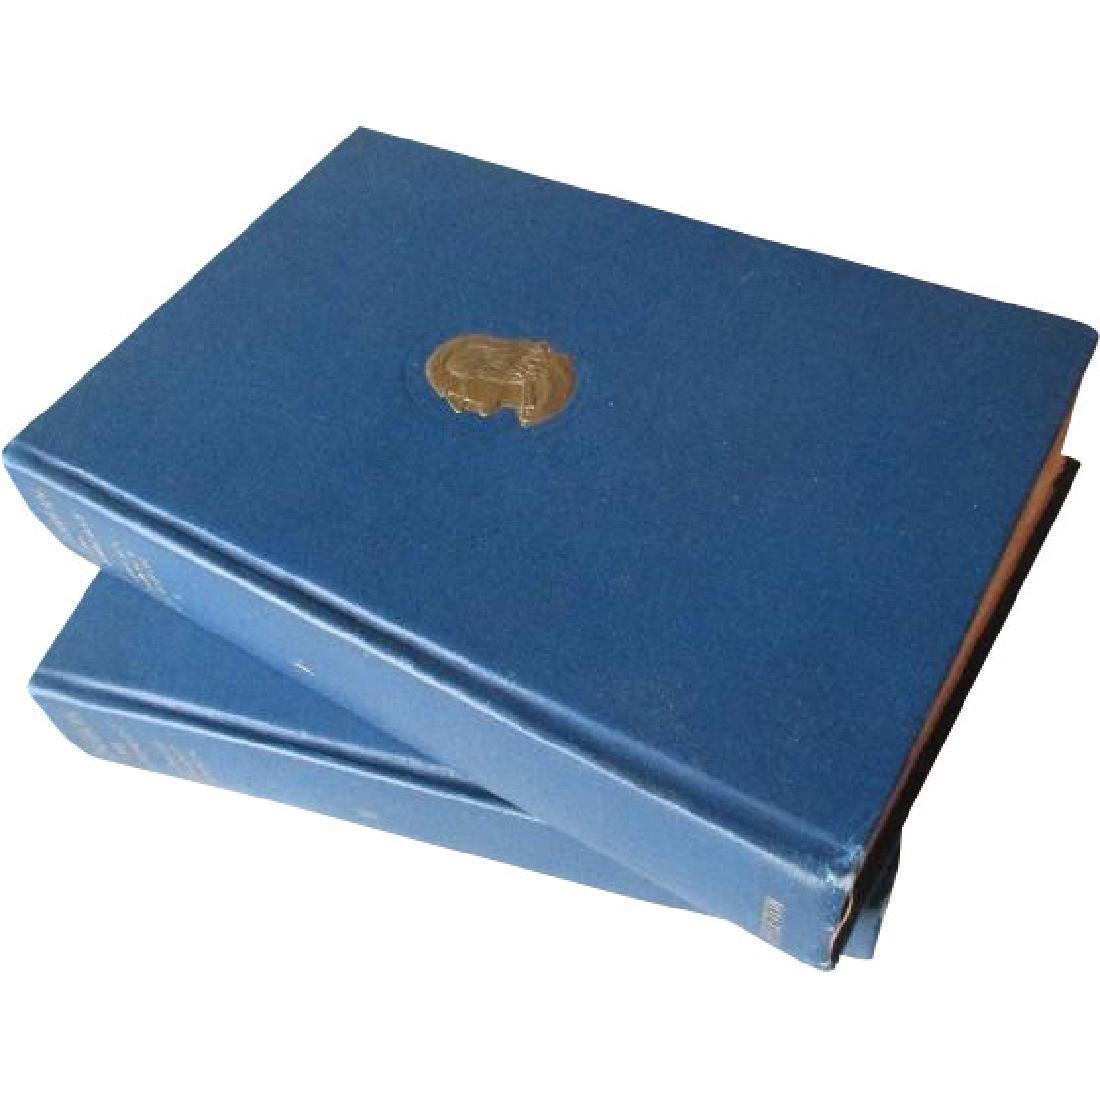 "Author Signed 2 Volume ""Audubon The Naturalist"" by"